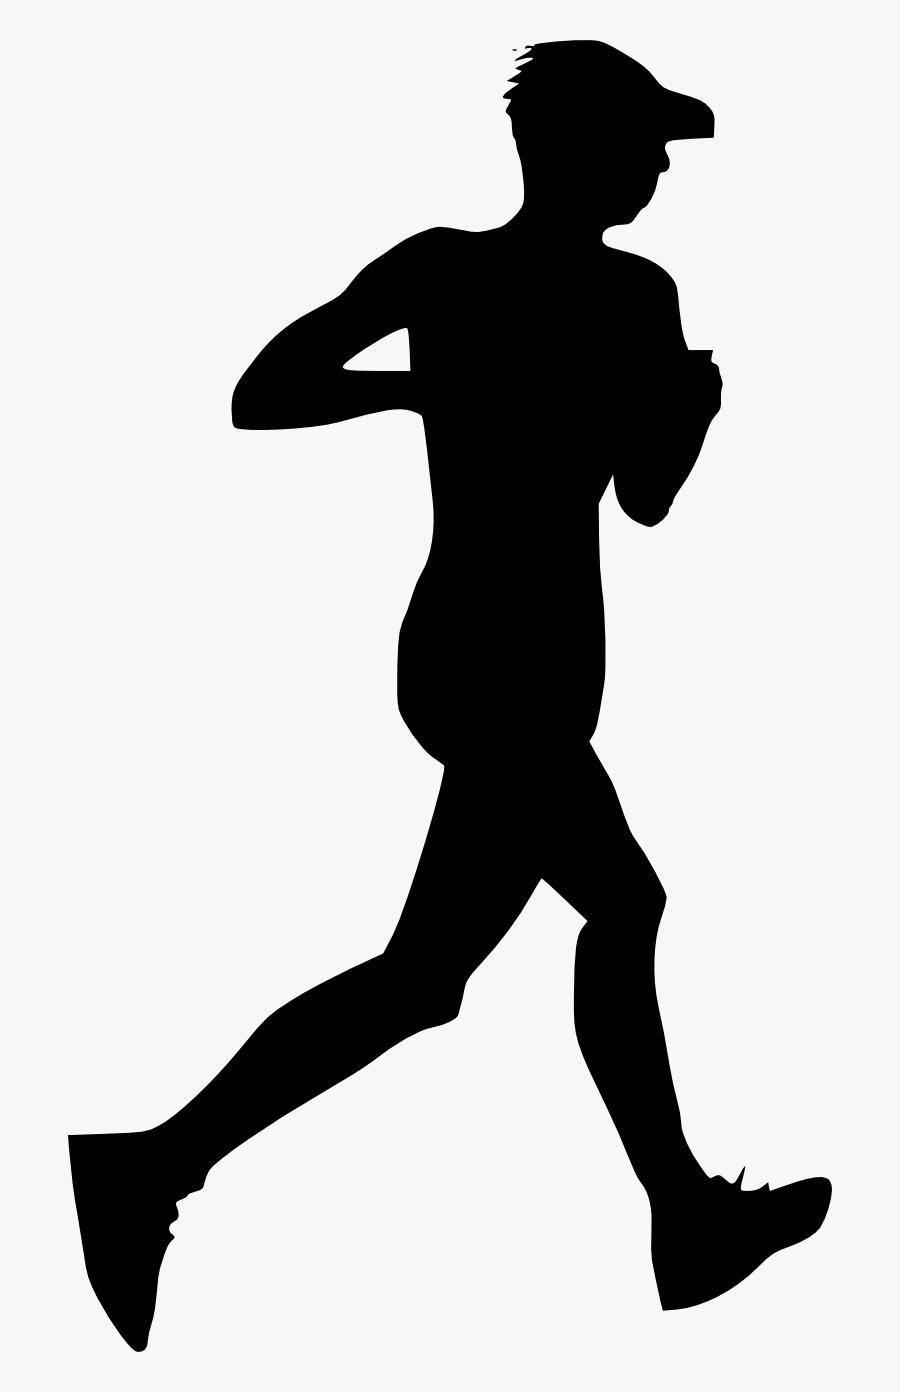 Silhouette Of People Running At Getdrawings - Person Running Silhouette Transparent, Transparent Clipart